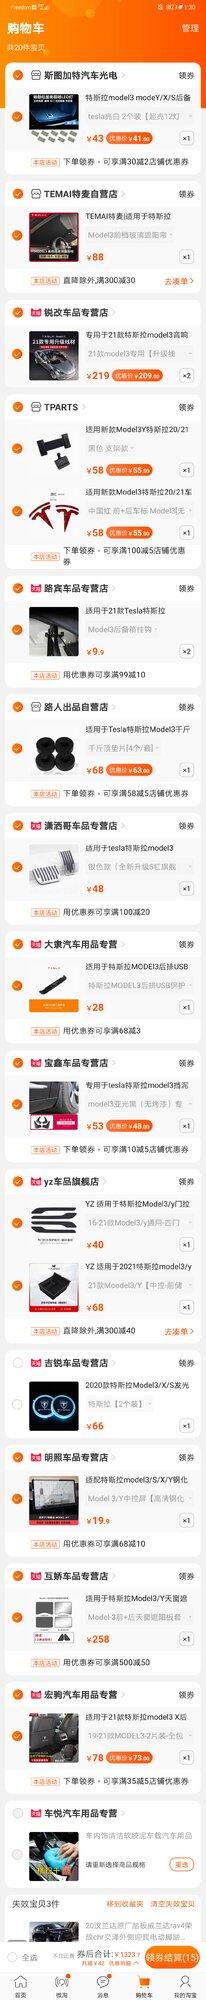 Screenshot_20210317_133052_com.taobao.taobao.jpg